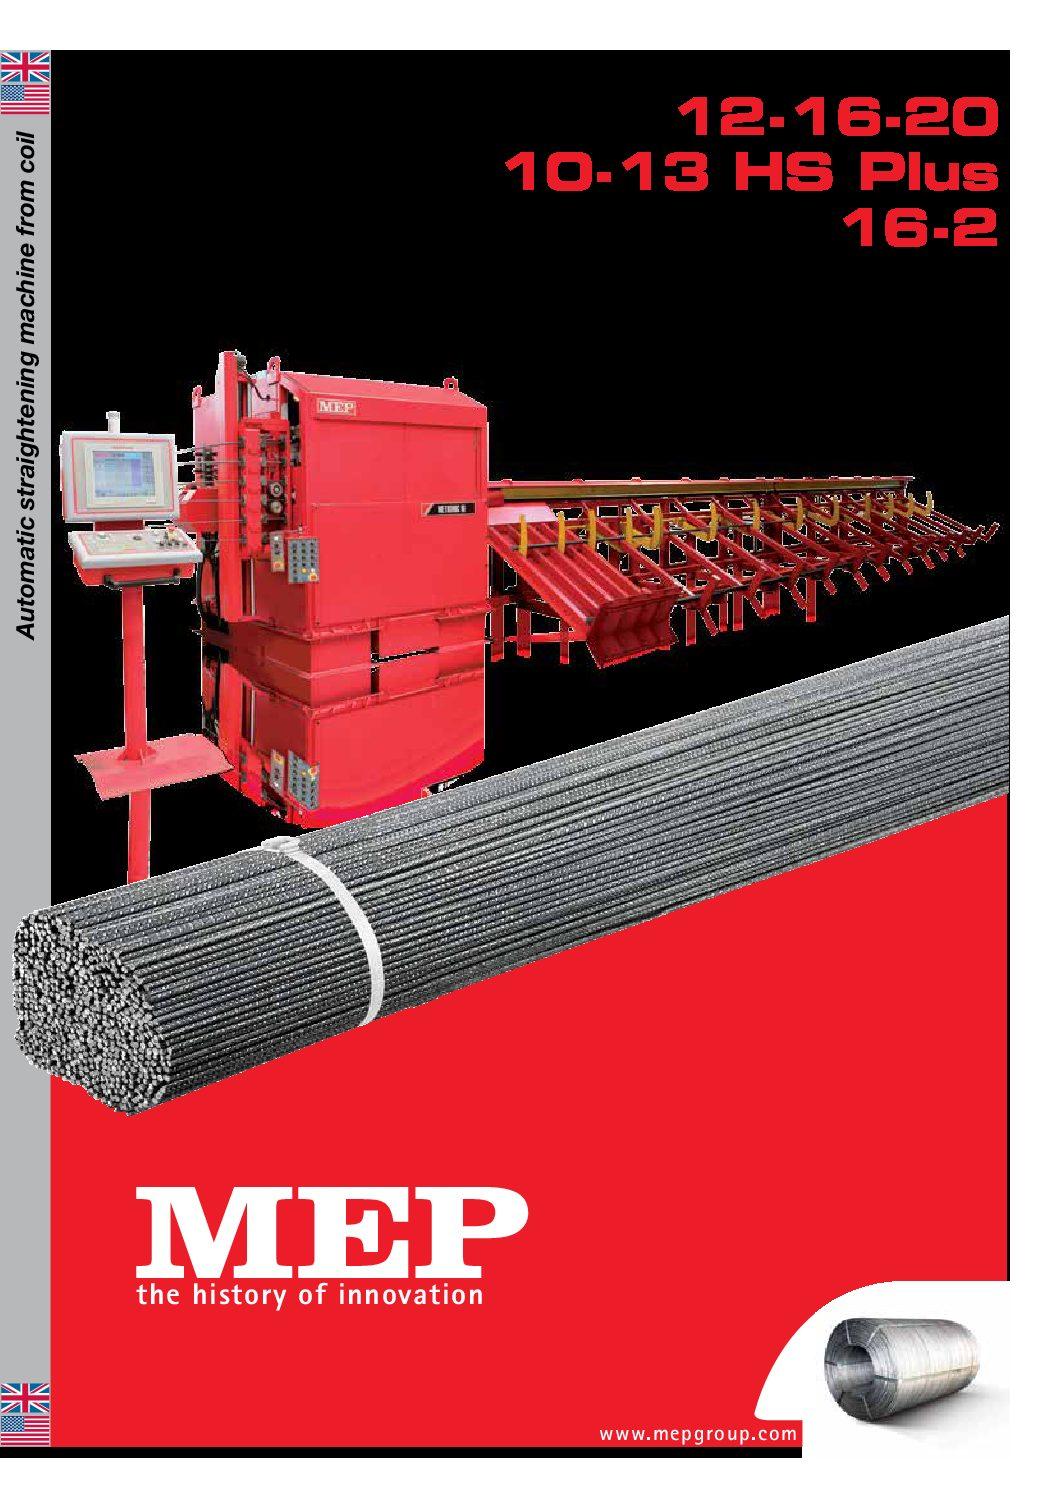 MEP - Metronic_Bitronic